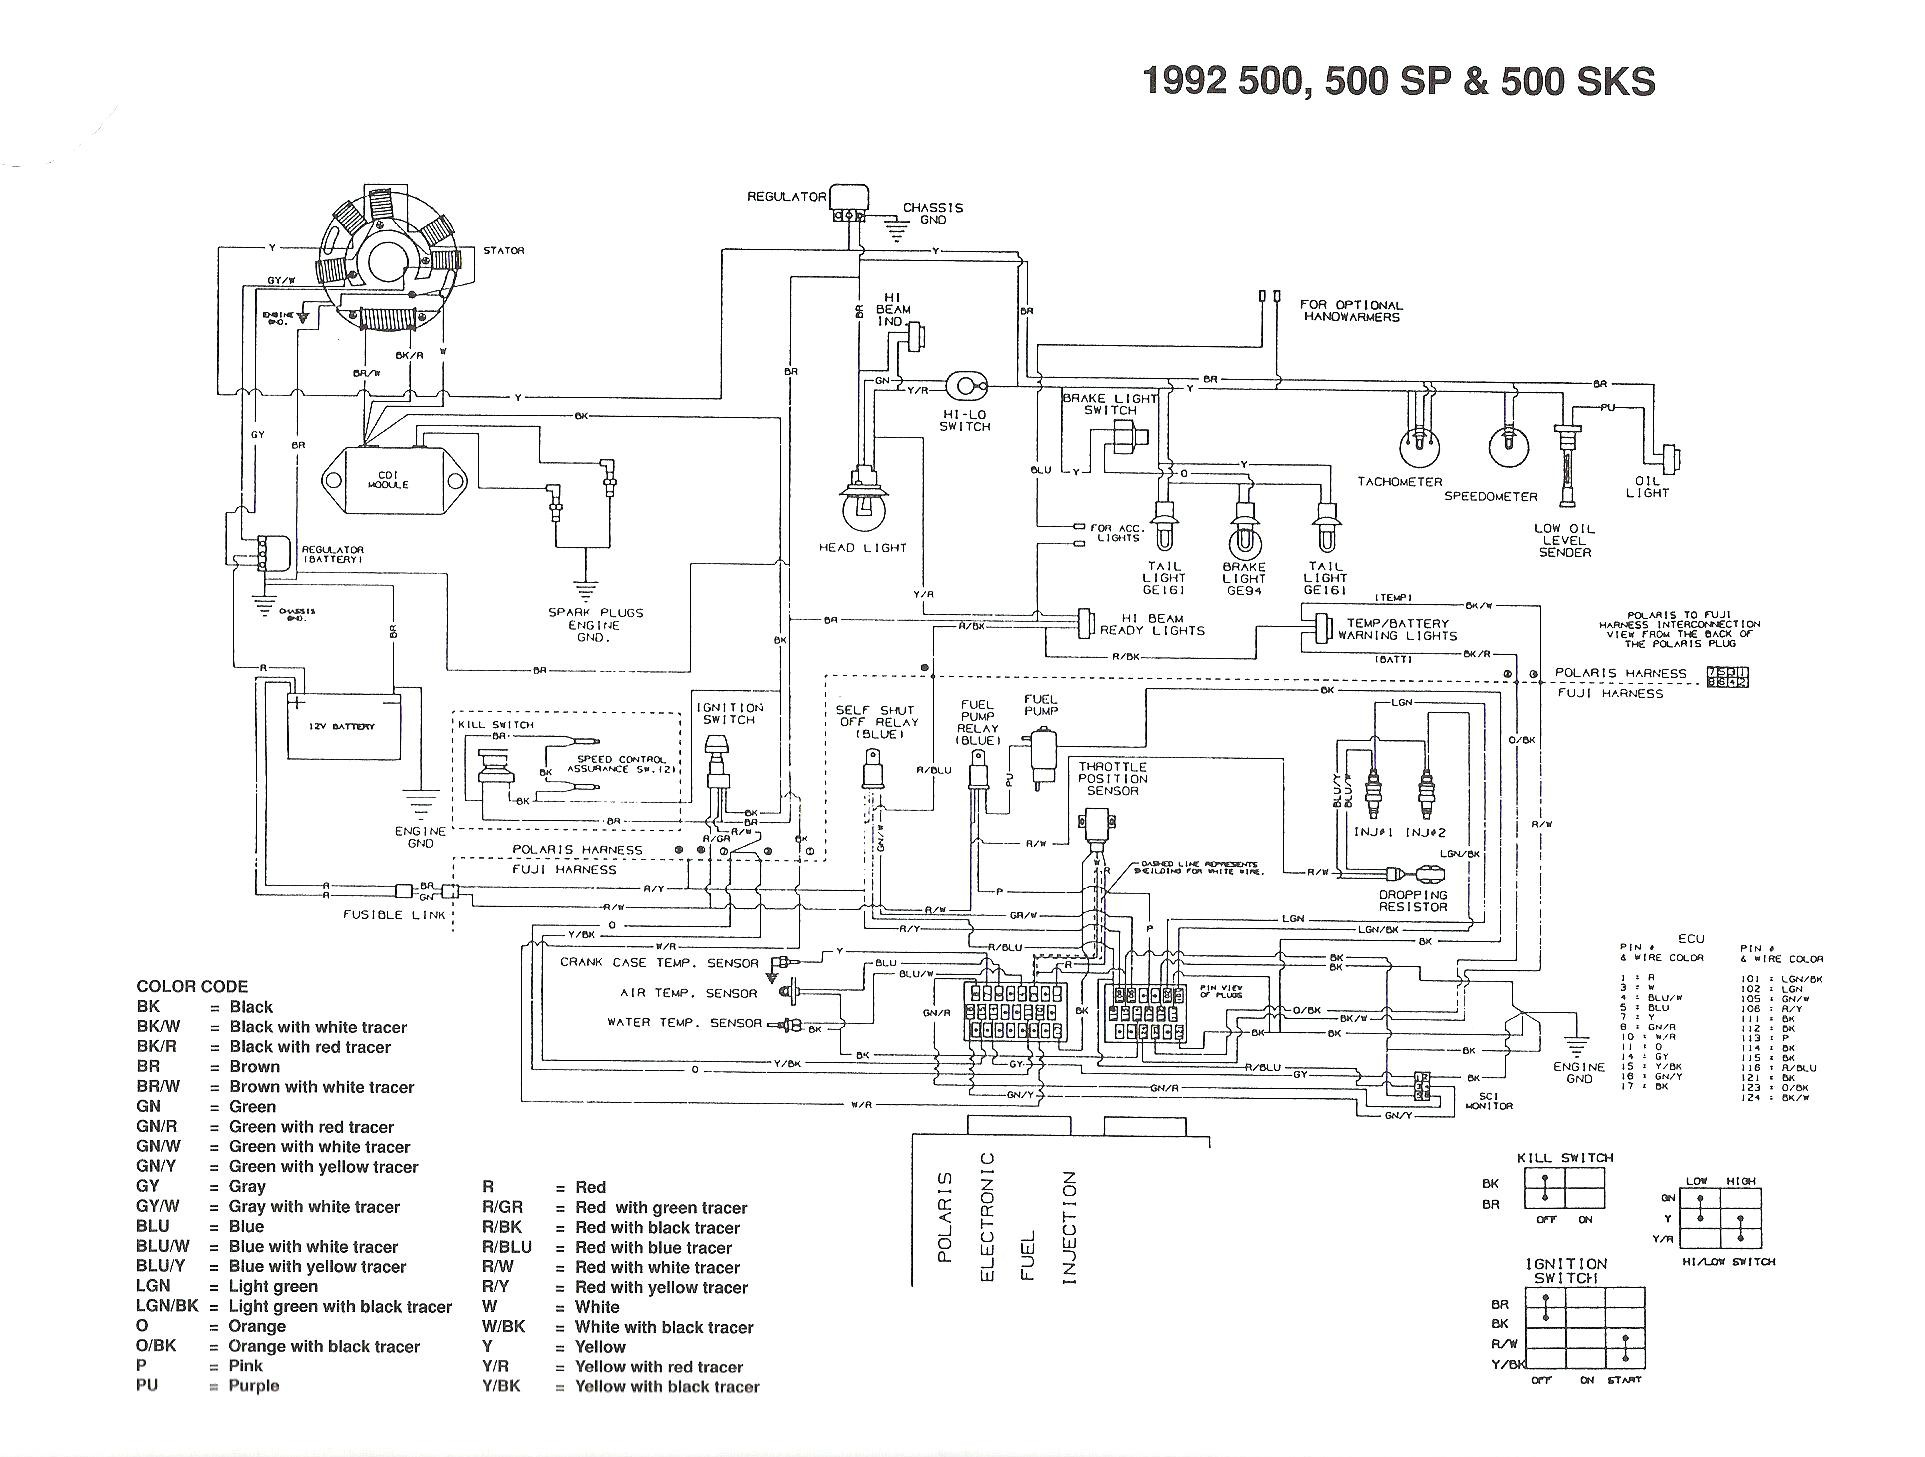 Polaris Predator 500 Engine Diagram Polaris Predator 500 Wiring Diagram 2003 Schematic 03 Sportsman Of Polaris Predator 500 Engine Diagram